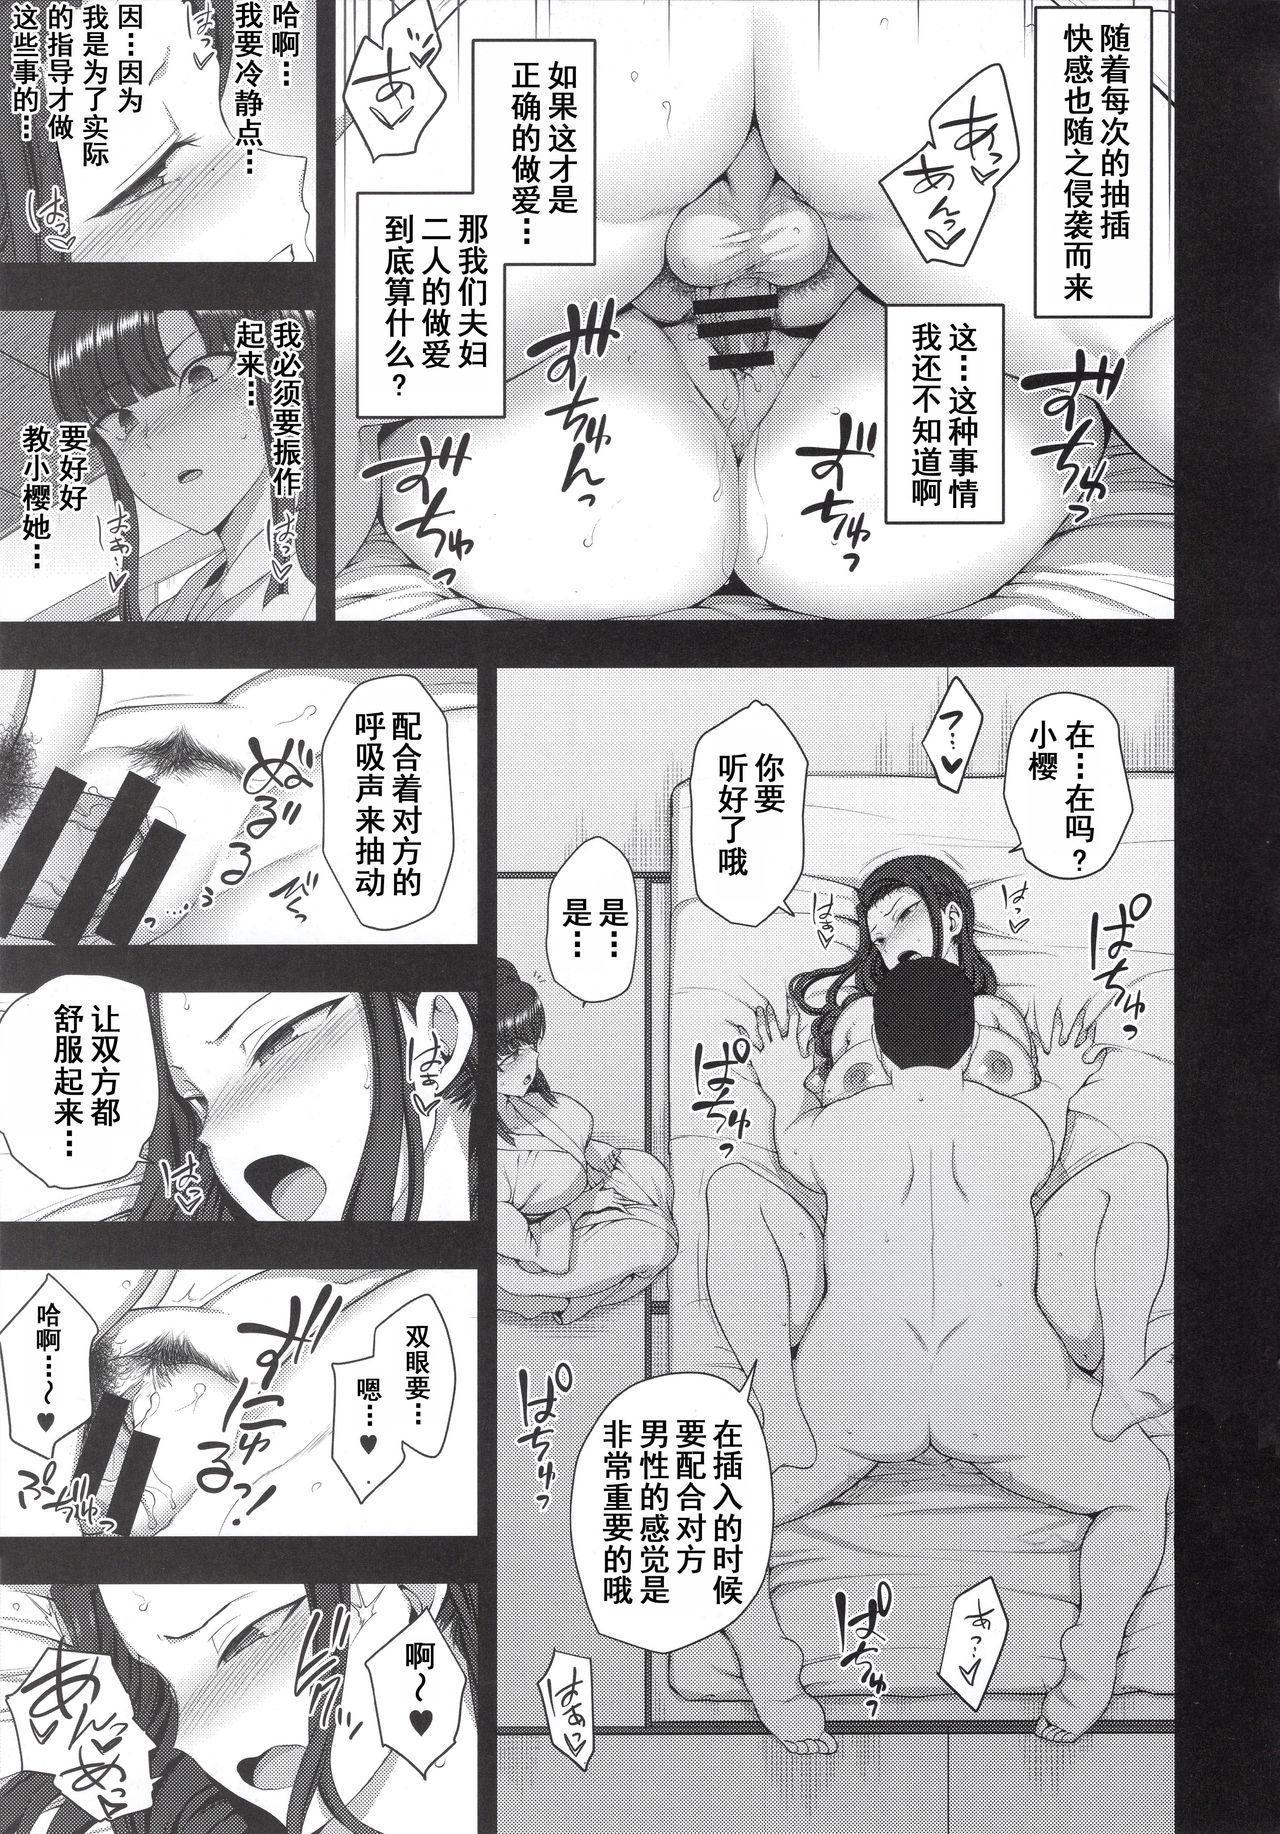 Saimin Seishidou 4: Ninshin Taiken Shidou 16